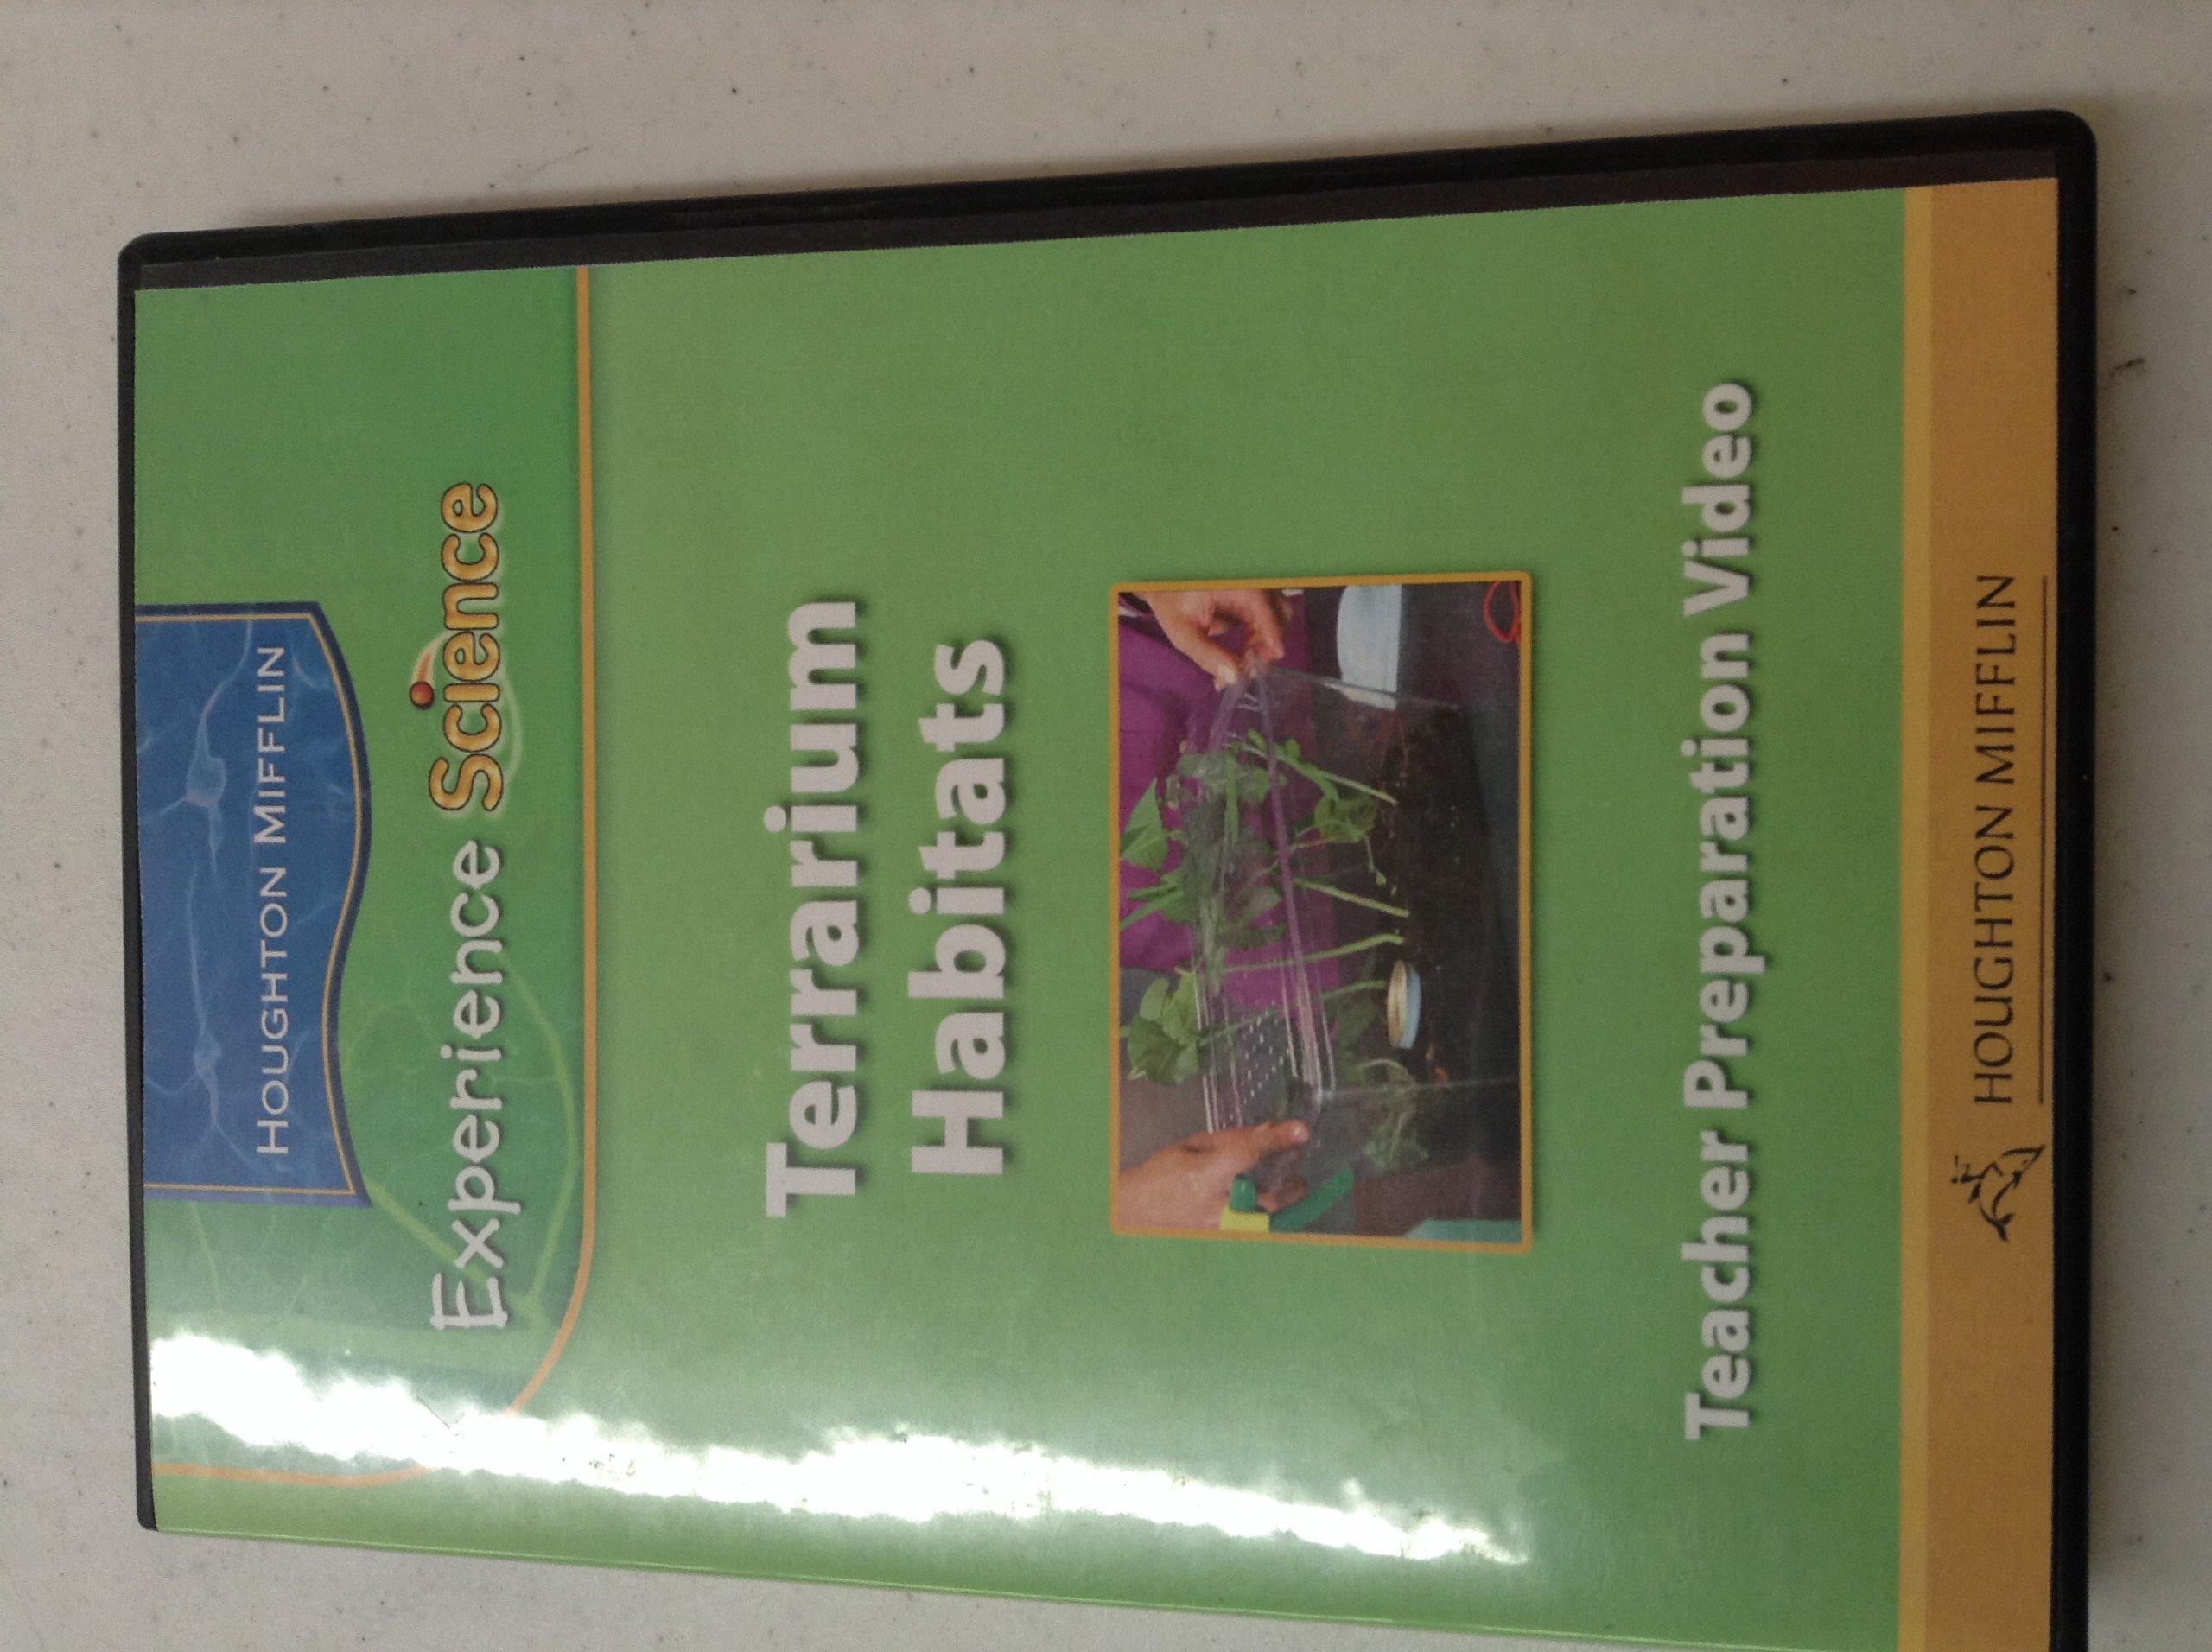 Download Houghton Mifflin Experience Science Florida: Terrarium Hbt Dvd Lv 4-5 Terrarium Habitats pdf epub